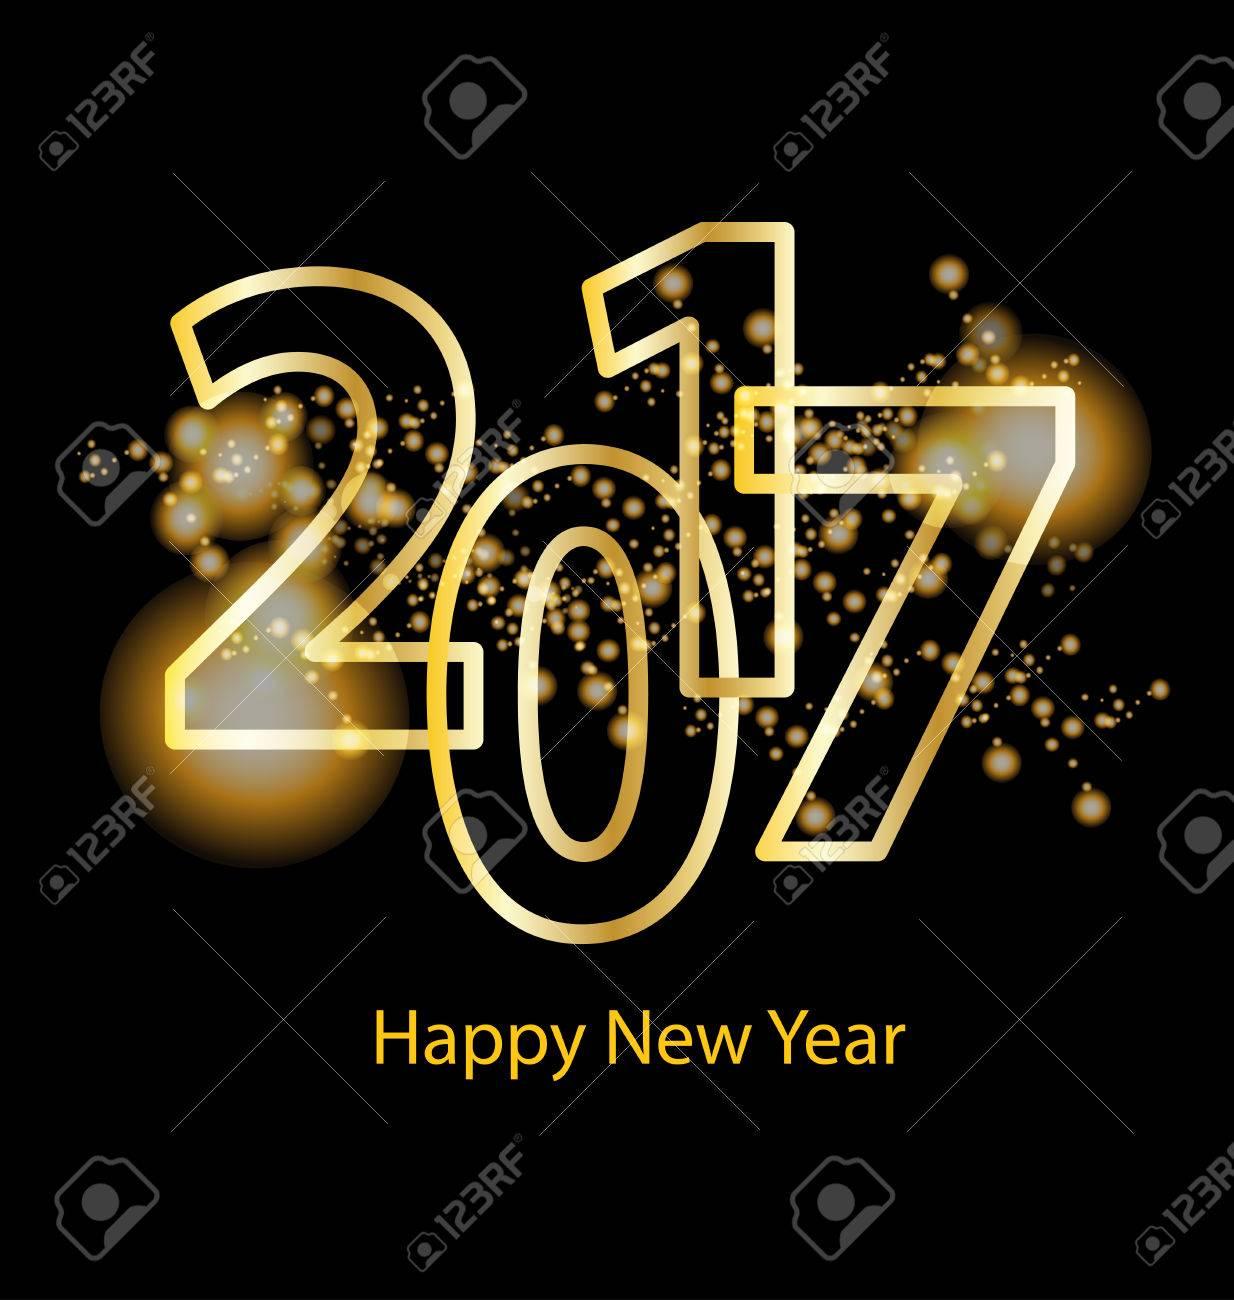 Happy new year 2017 - 63558423